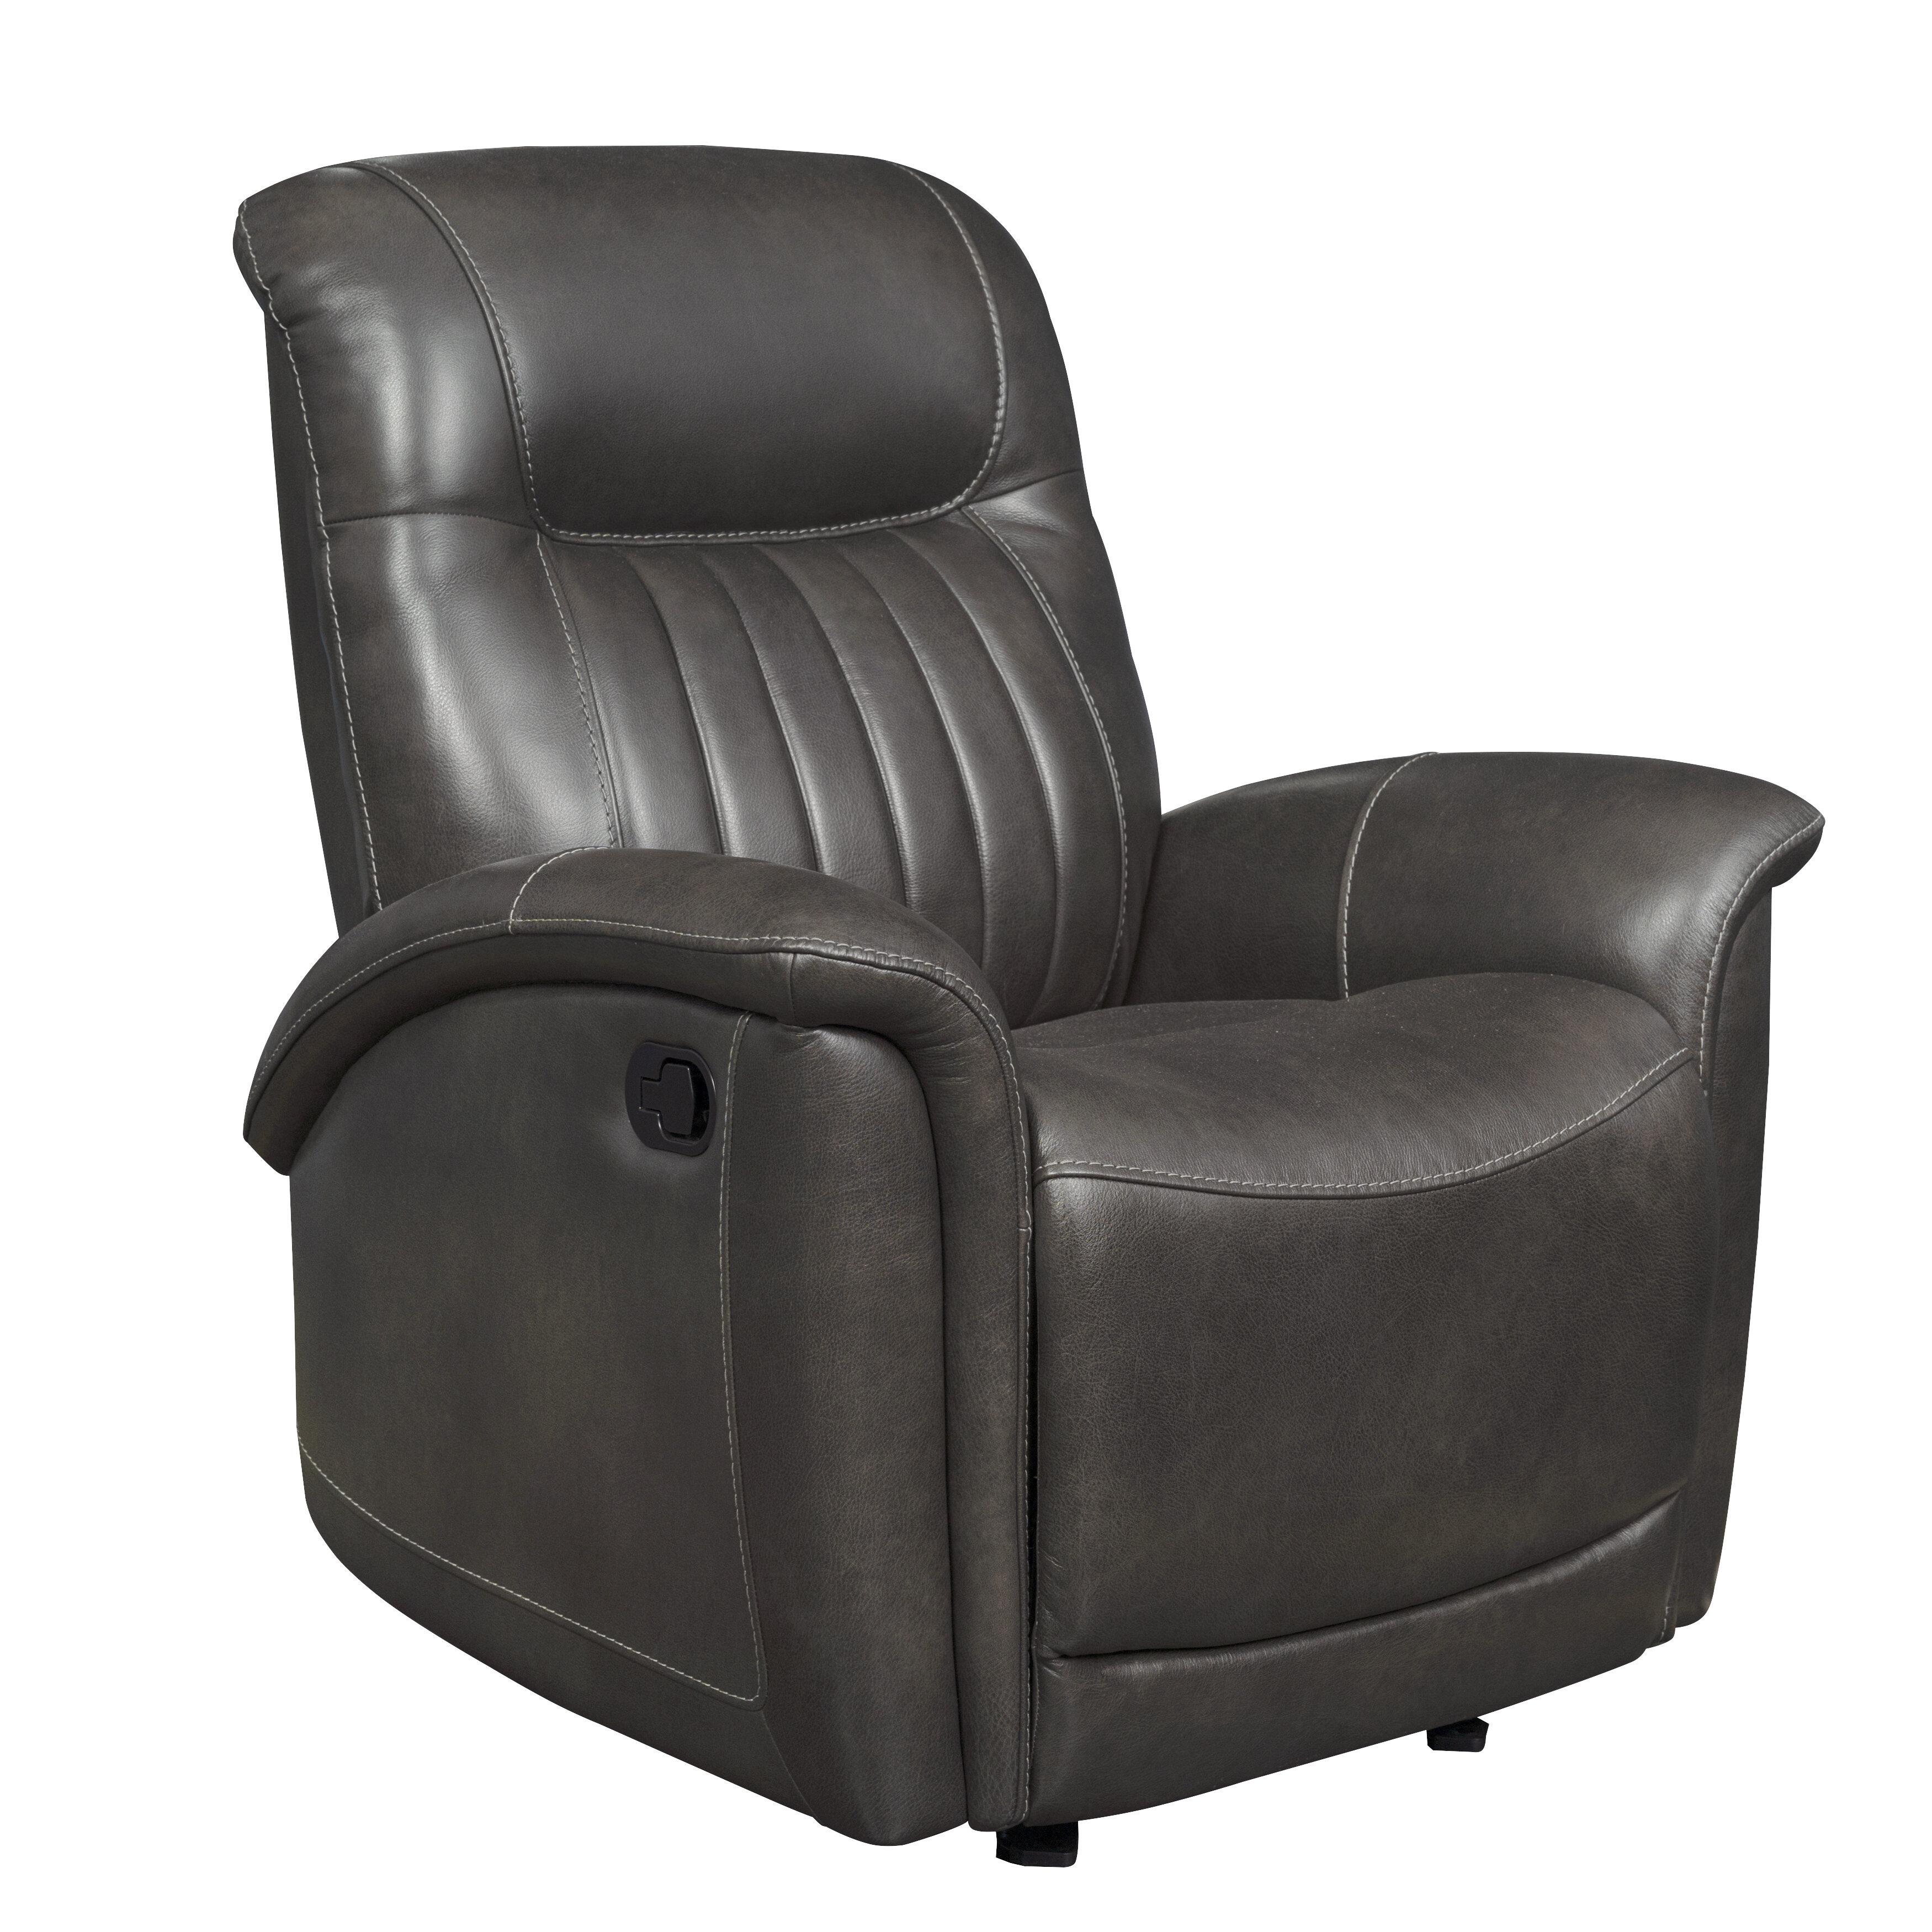 Latitude Run Trachoni Genuine Leather Recliner Reviews Wayfair